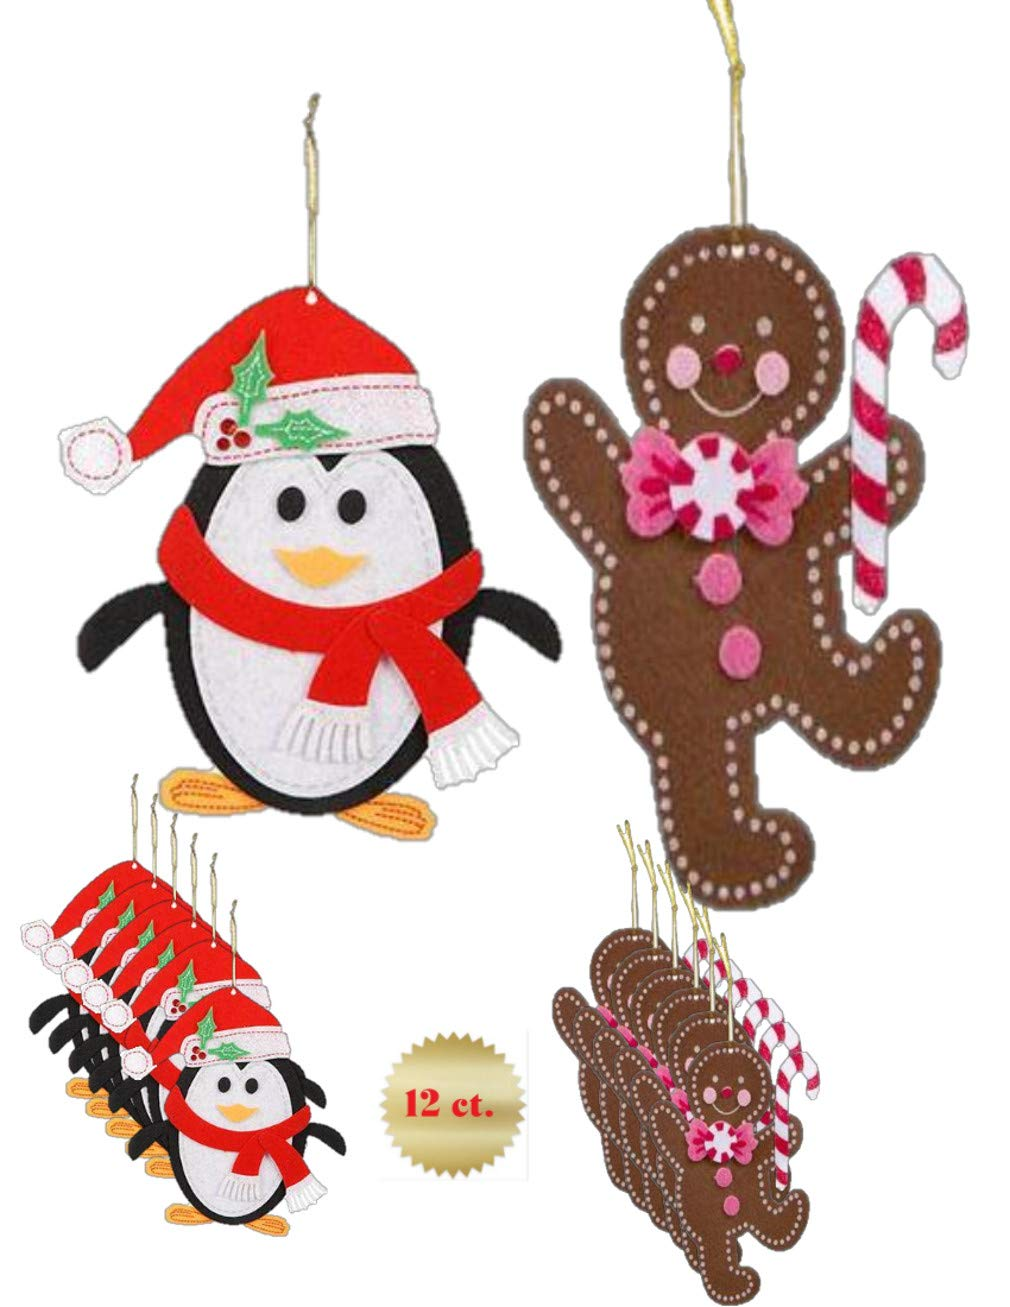 GBBD Christmas Felt Craft Kits - Home Made Tree Ornaments ( 12 Total )